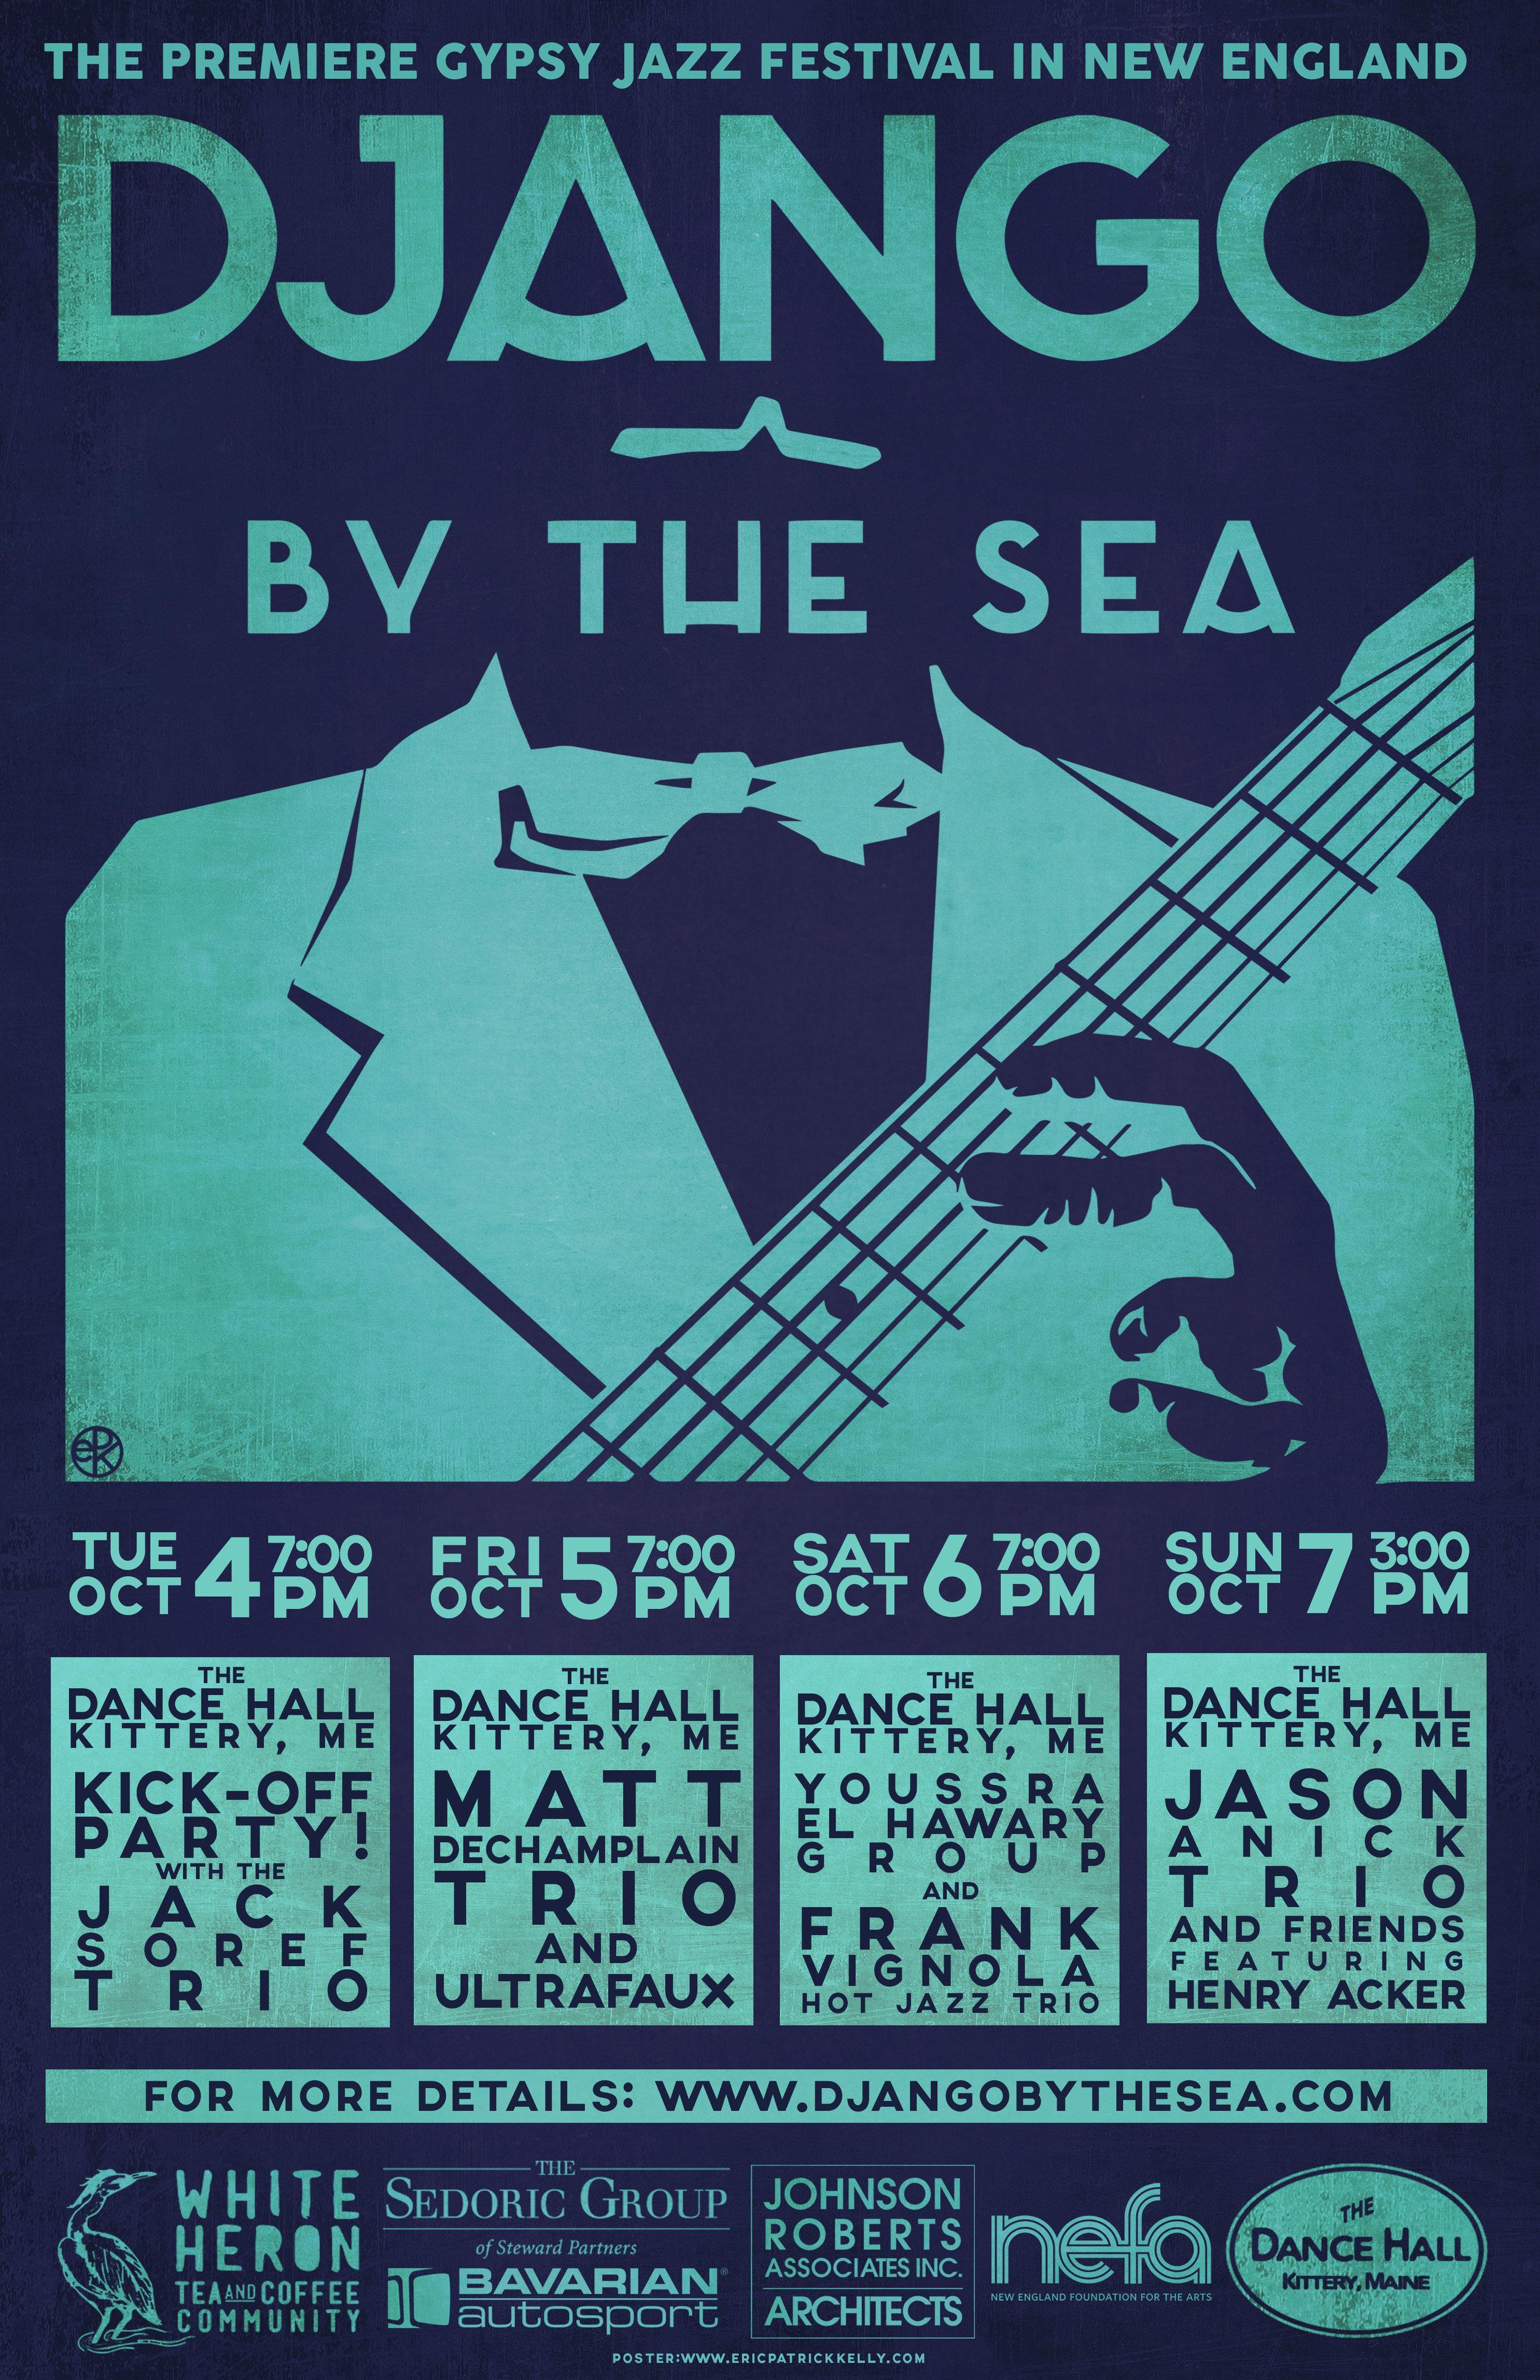 django by the sea poster18.jpg